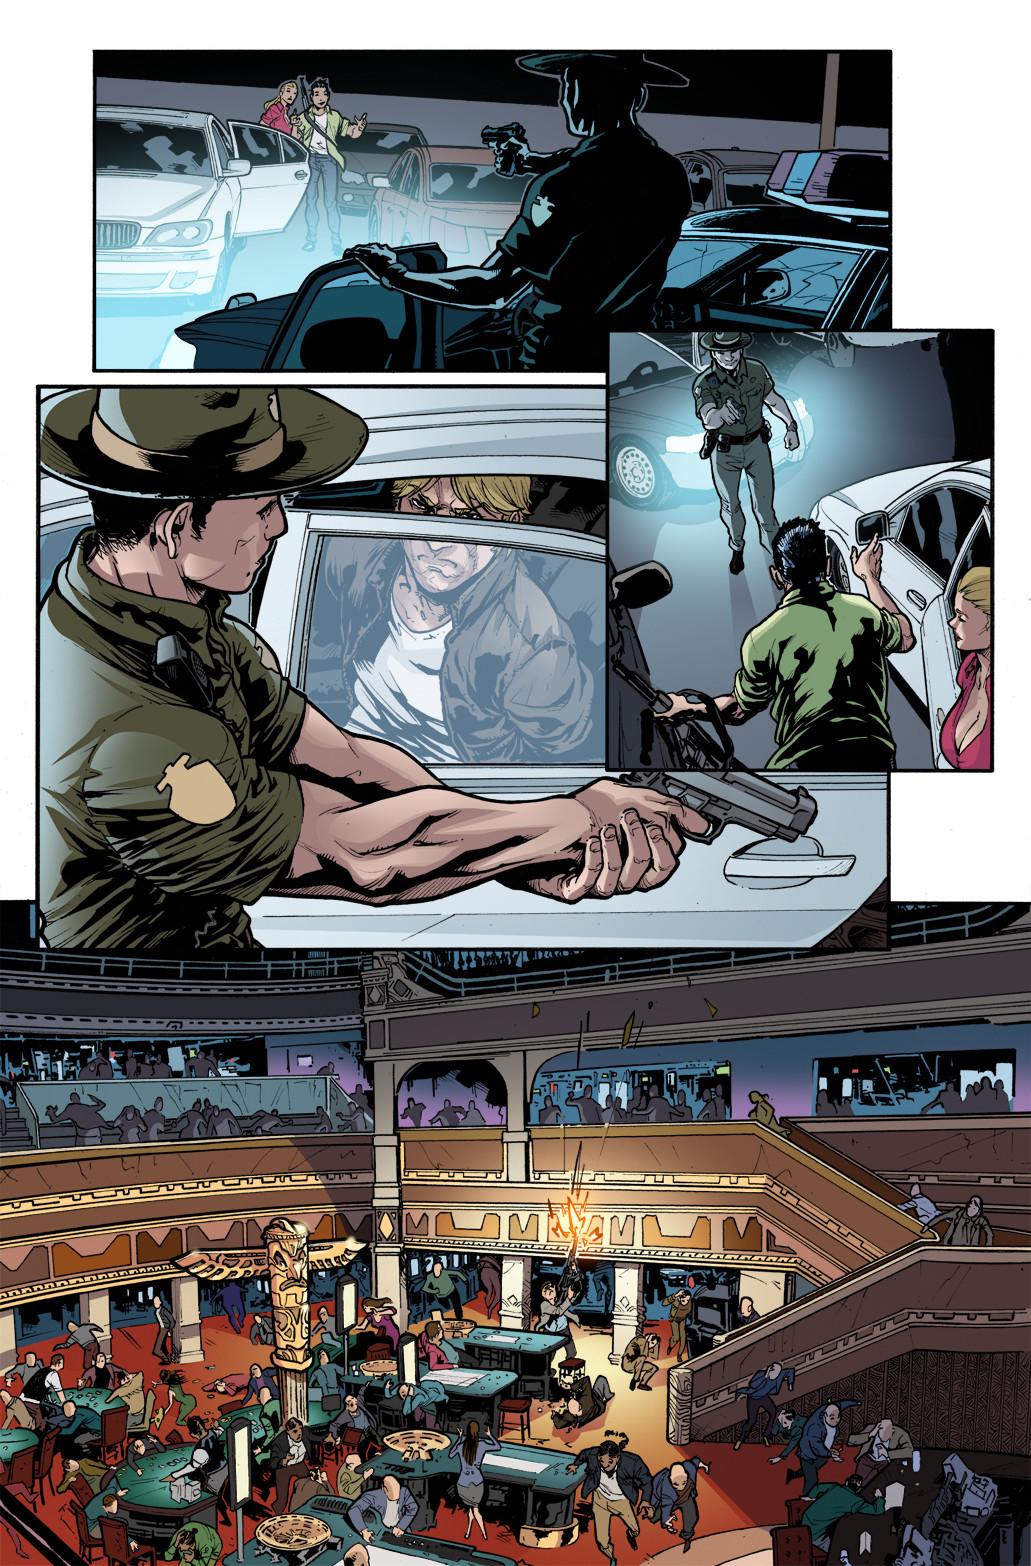 3 GUNS - #6, page 4